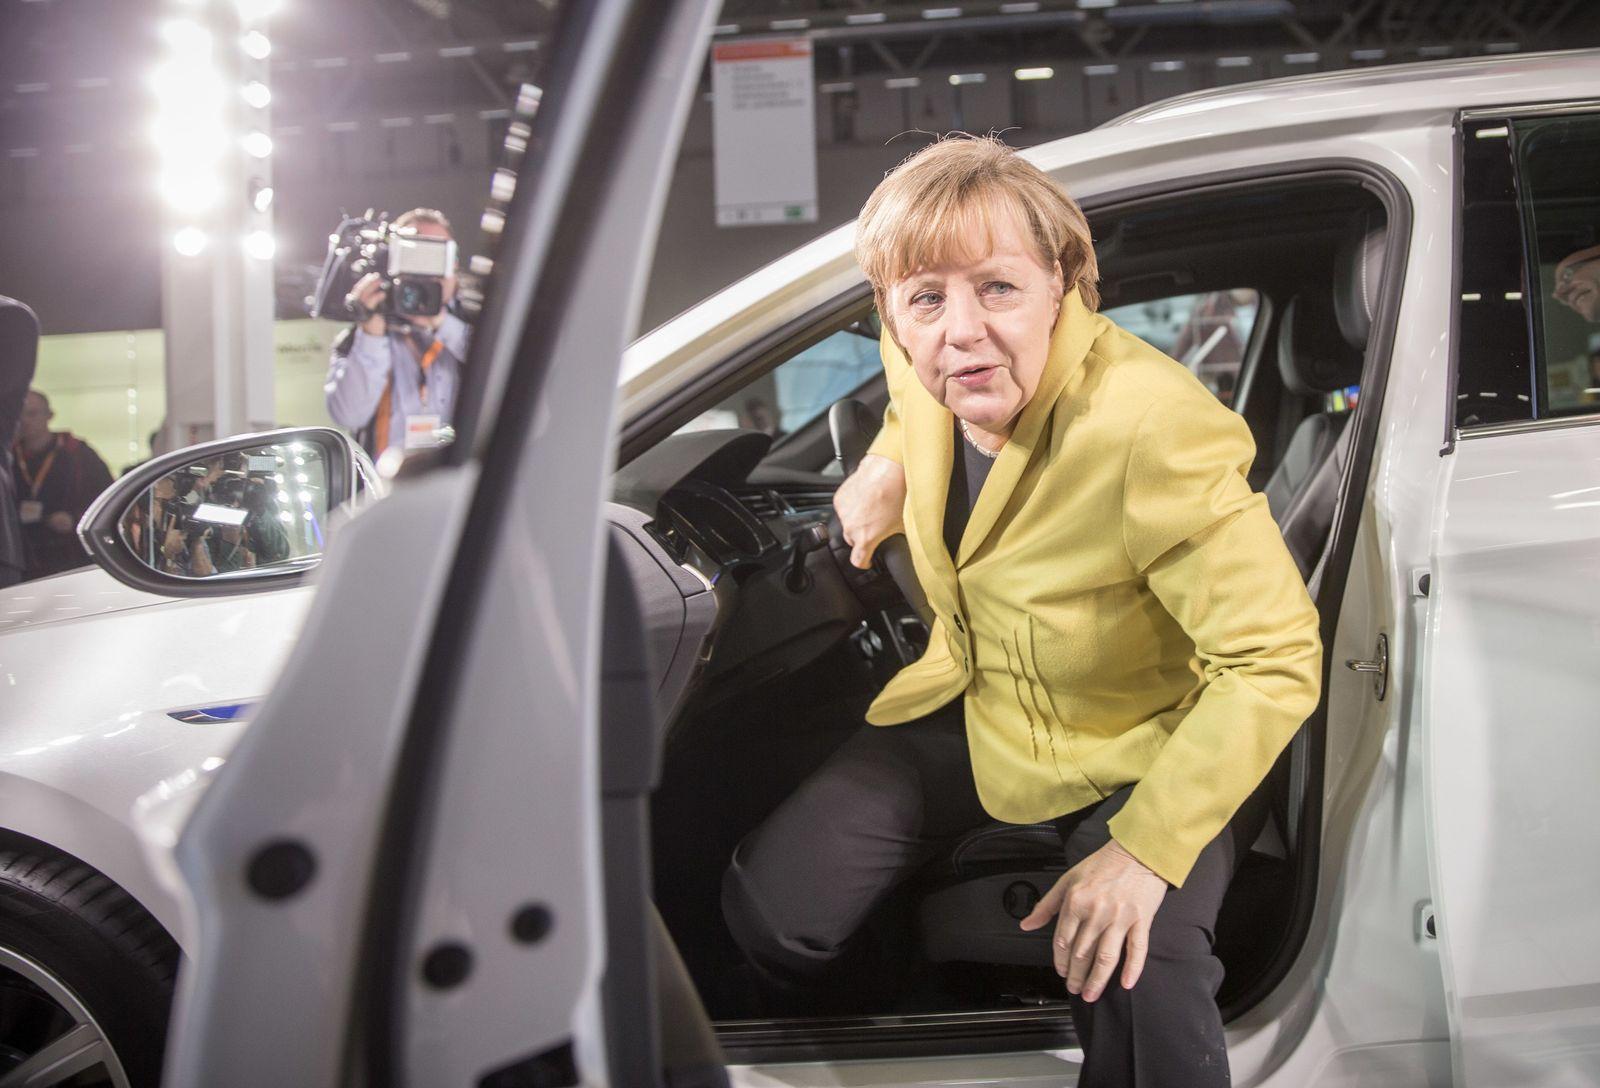 SYMBOLBILD Lobbyismus/ CDU-Bundesparteitag/ Merkel